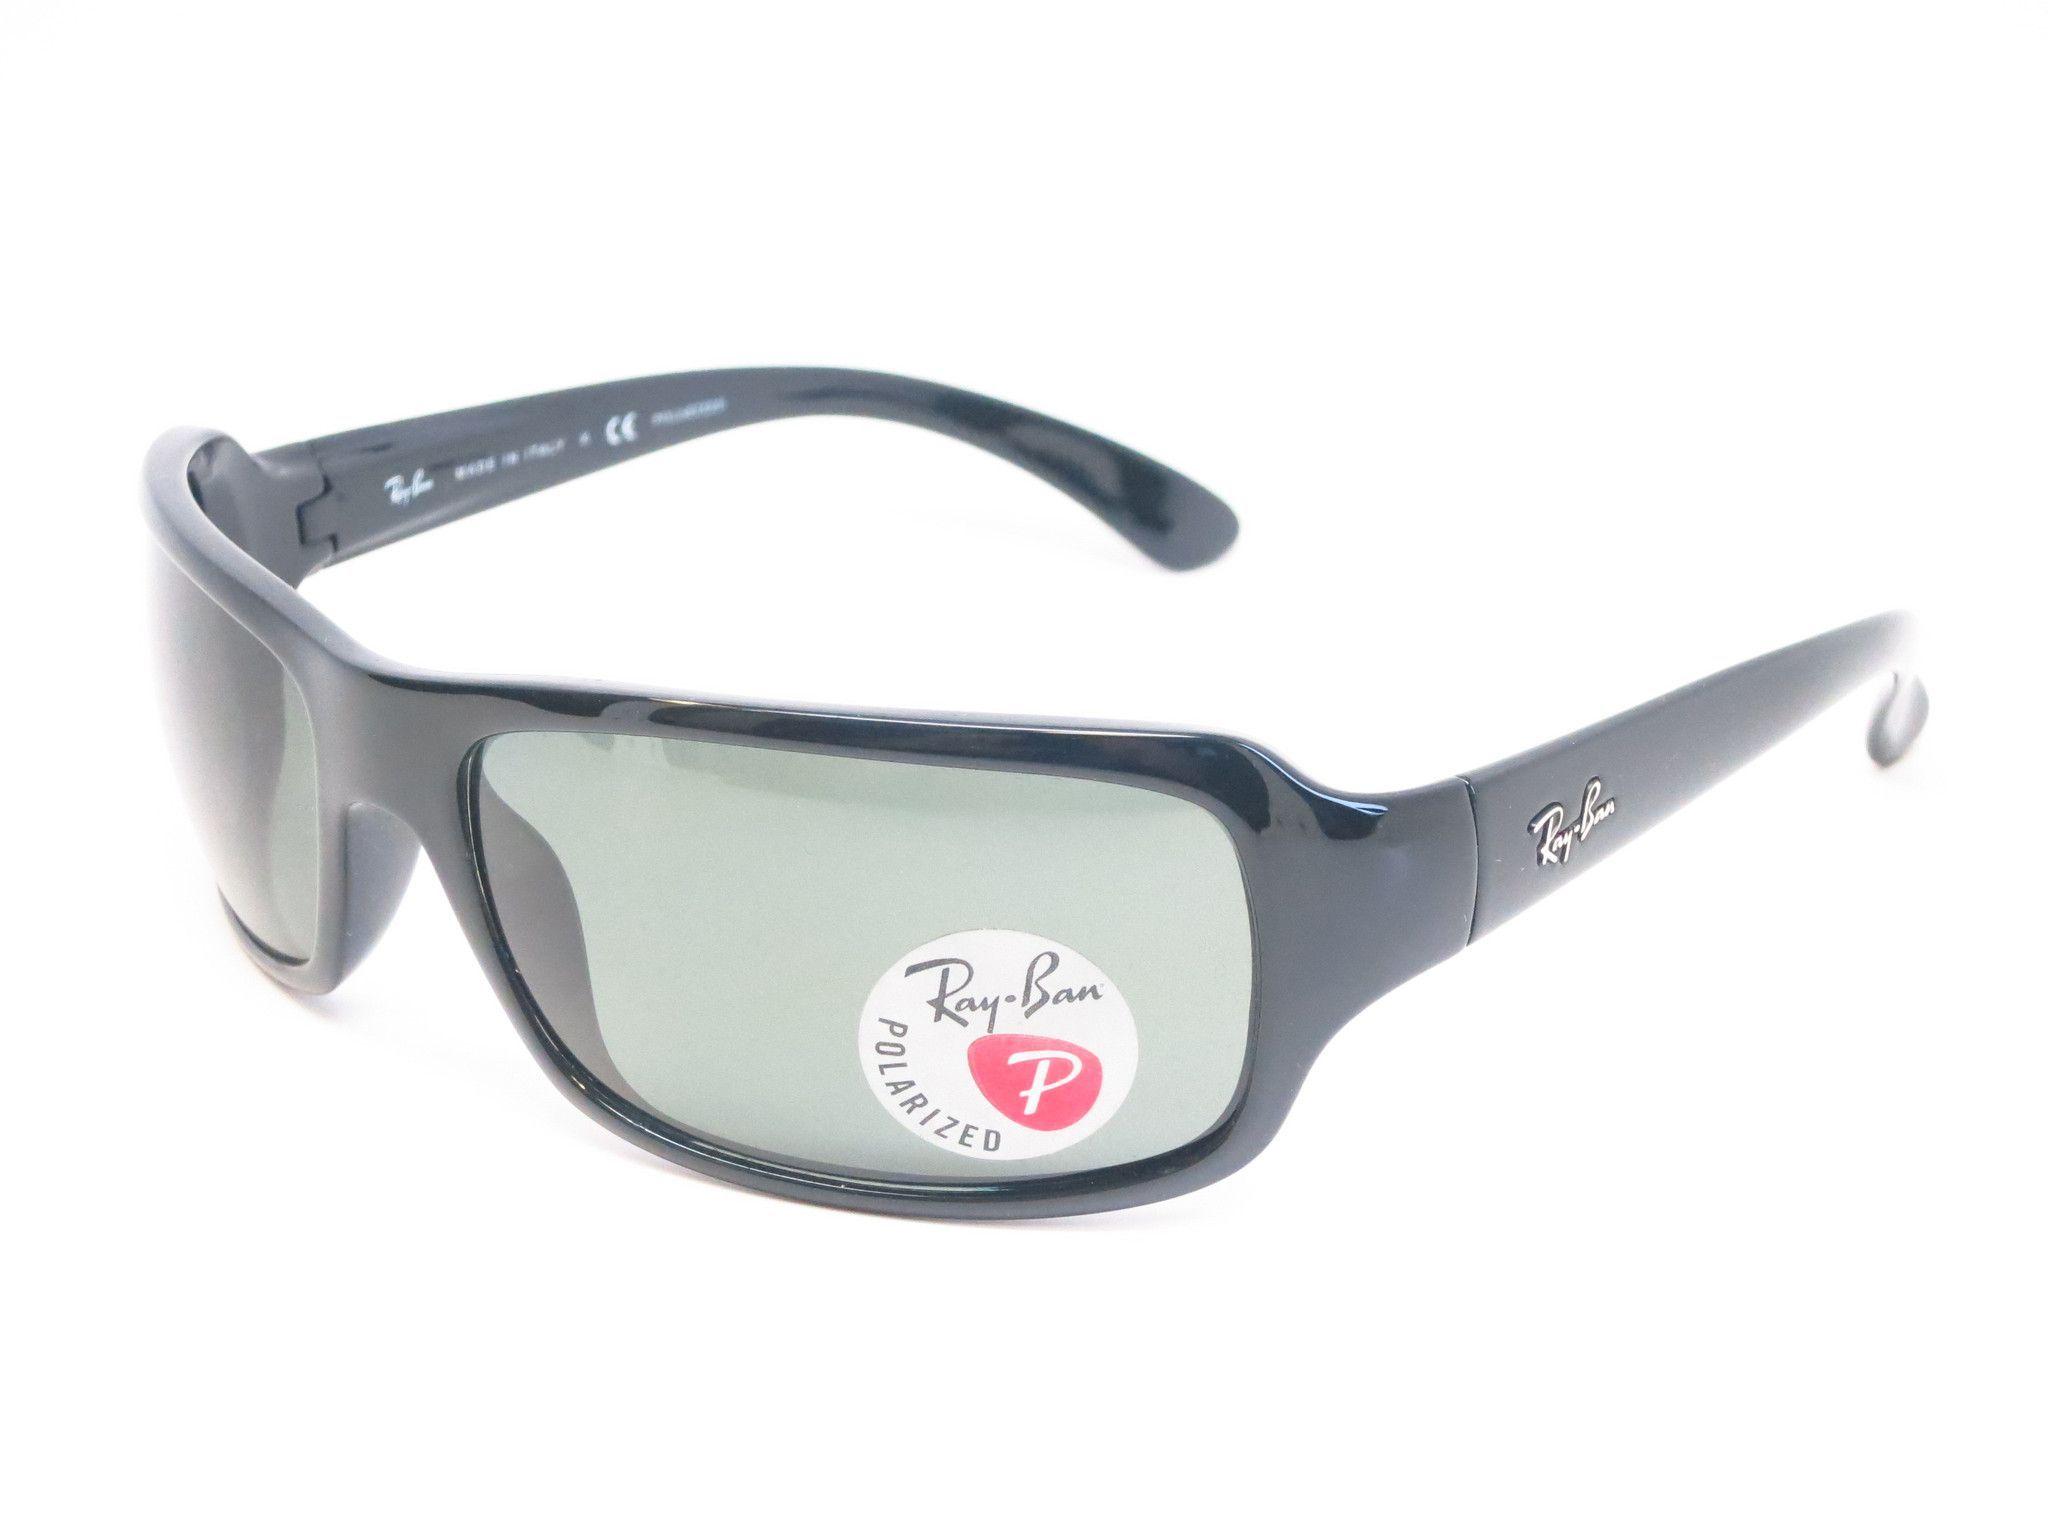 e8b6a80b0f Ray-Ban RB 4075 HighStreet 601 58 Black Sunglasses - RayBan